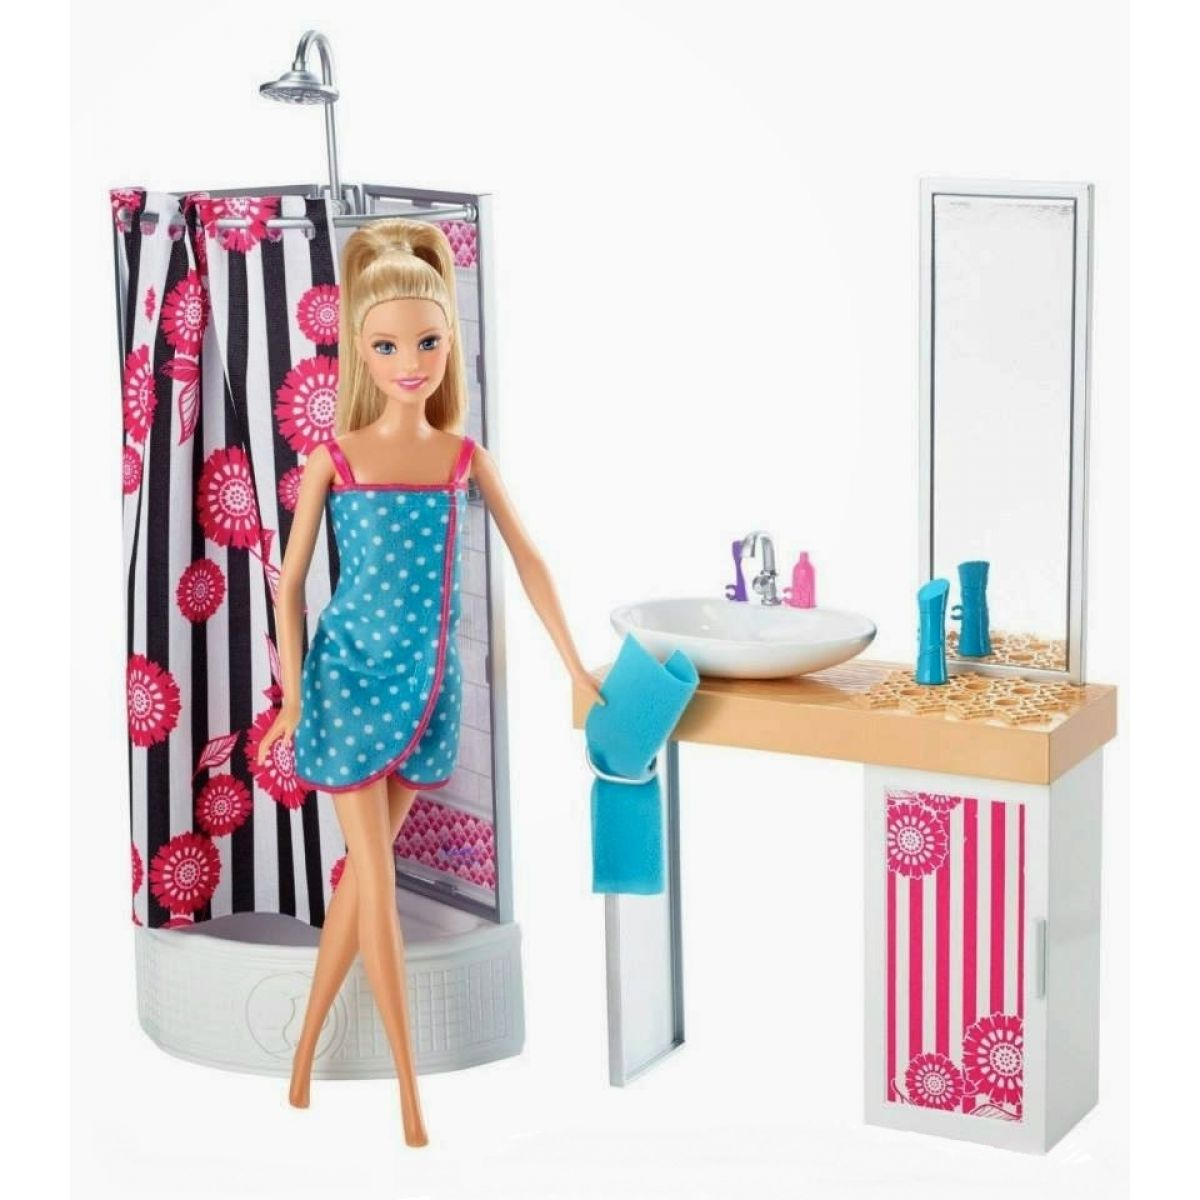 Barbie Panenka a pokojík - Koupelna